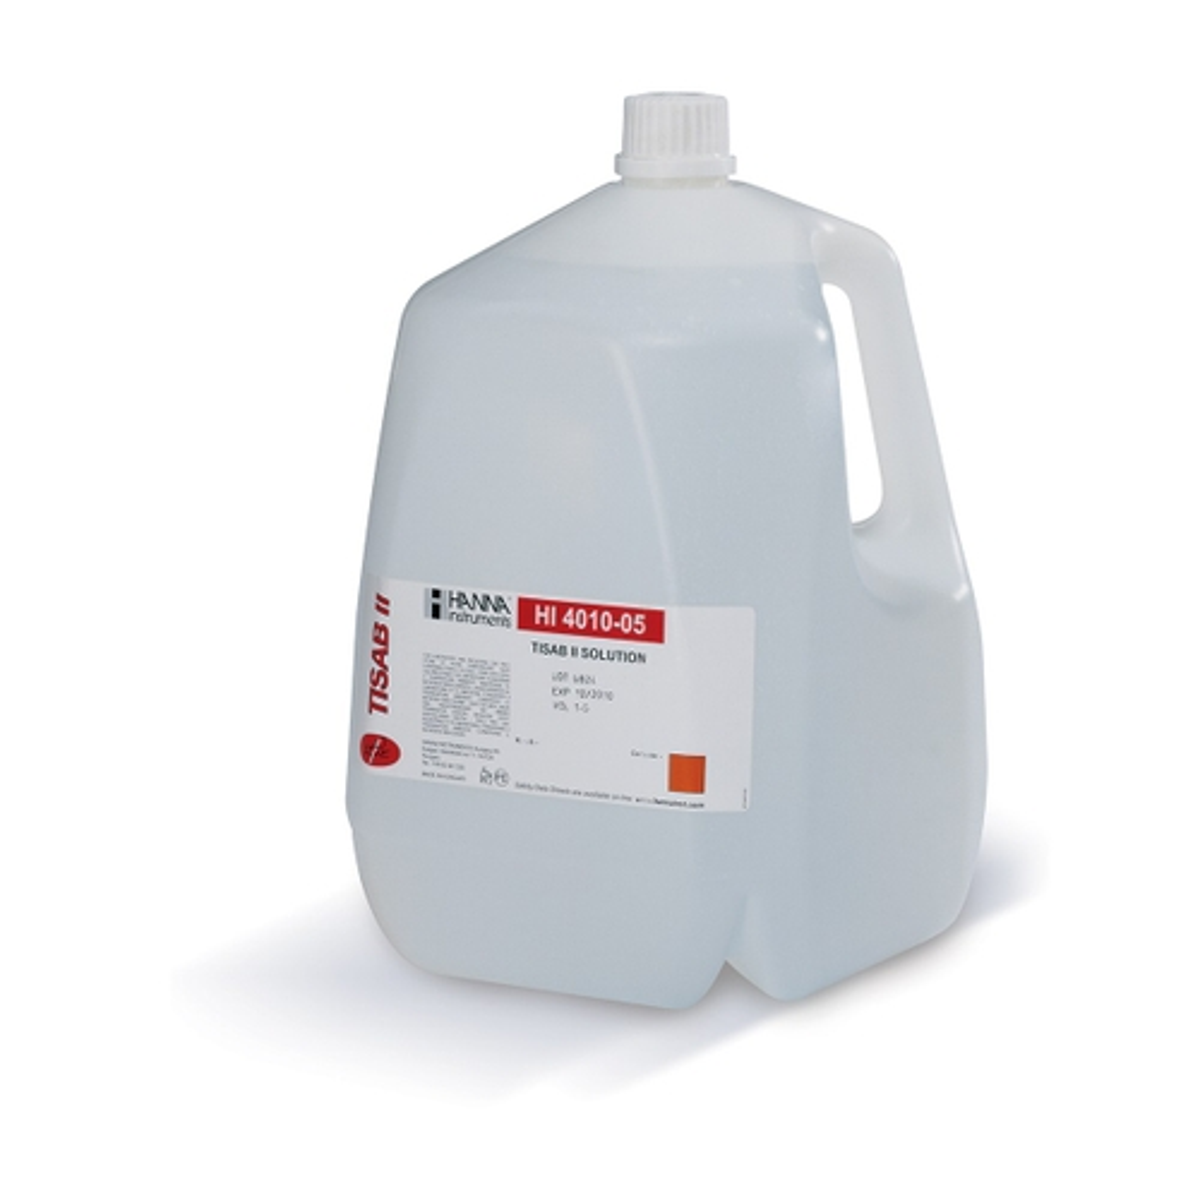 TISAB II for Fluoride ISEs (1 gallon) - HI4010-05